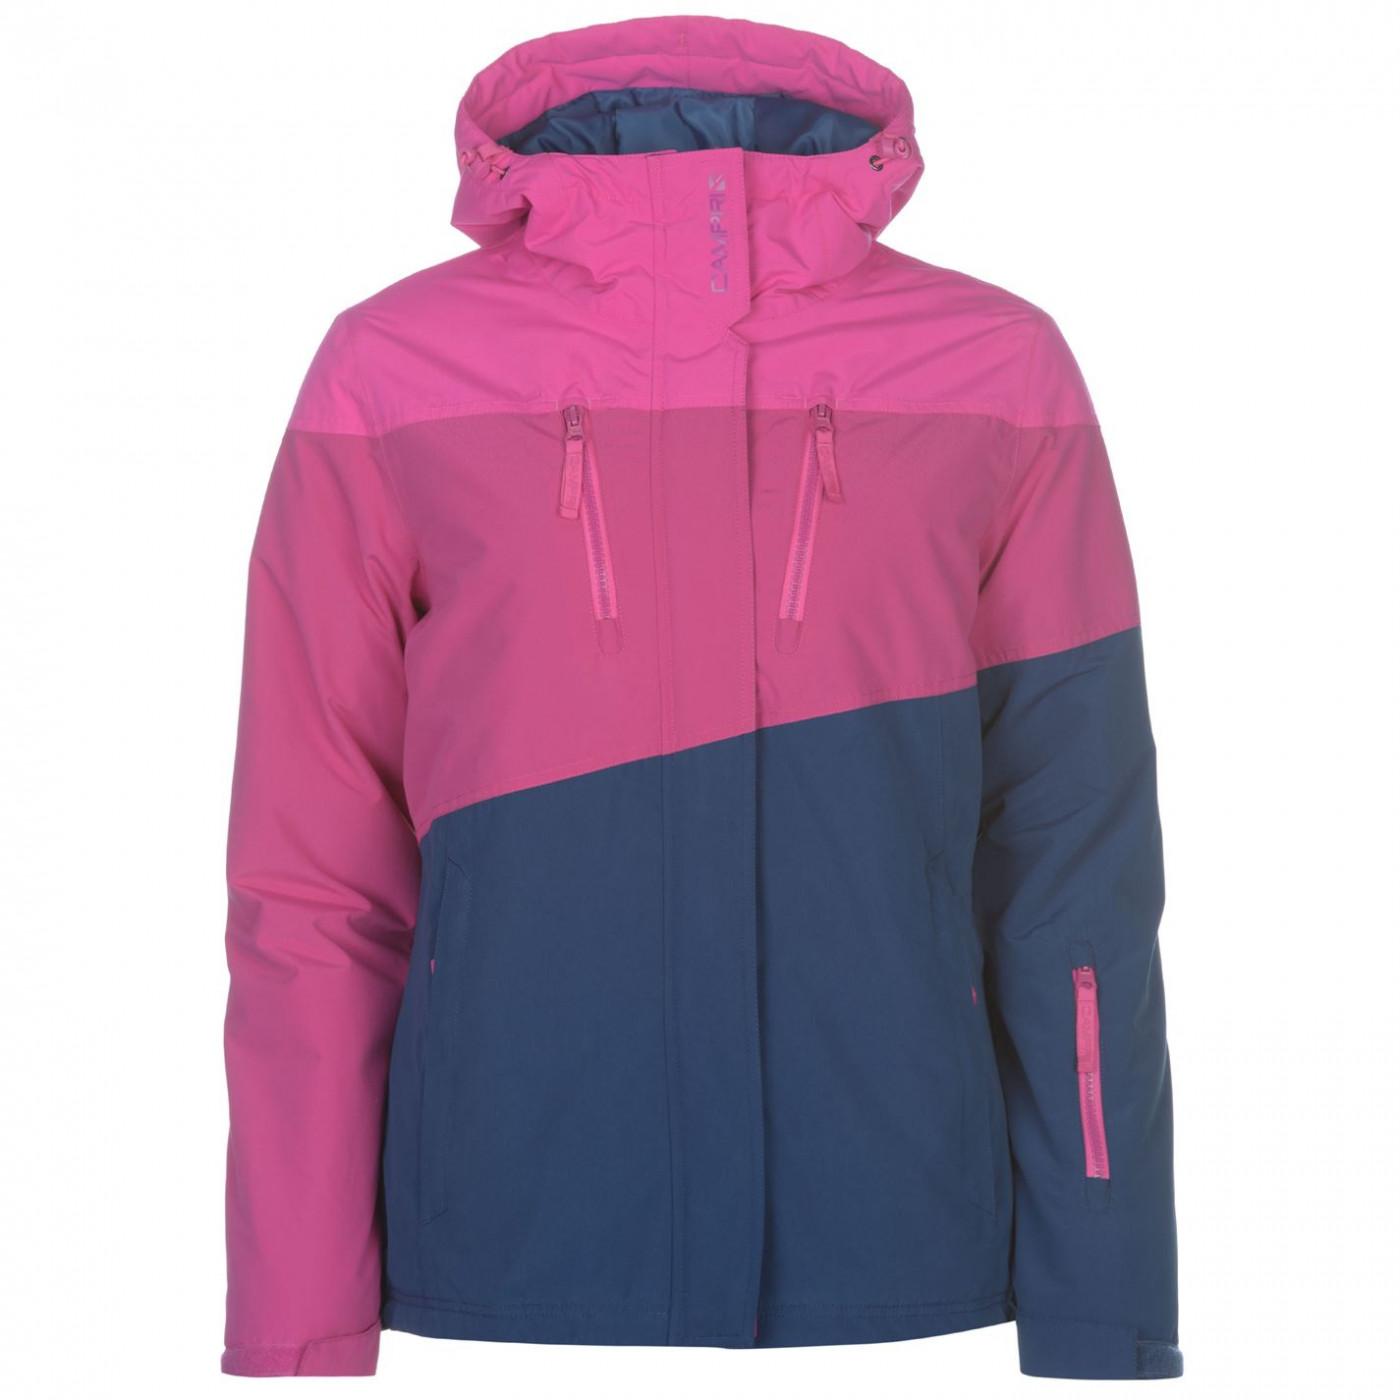 Campri Ski Jacket Ladies